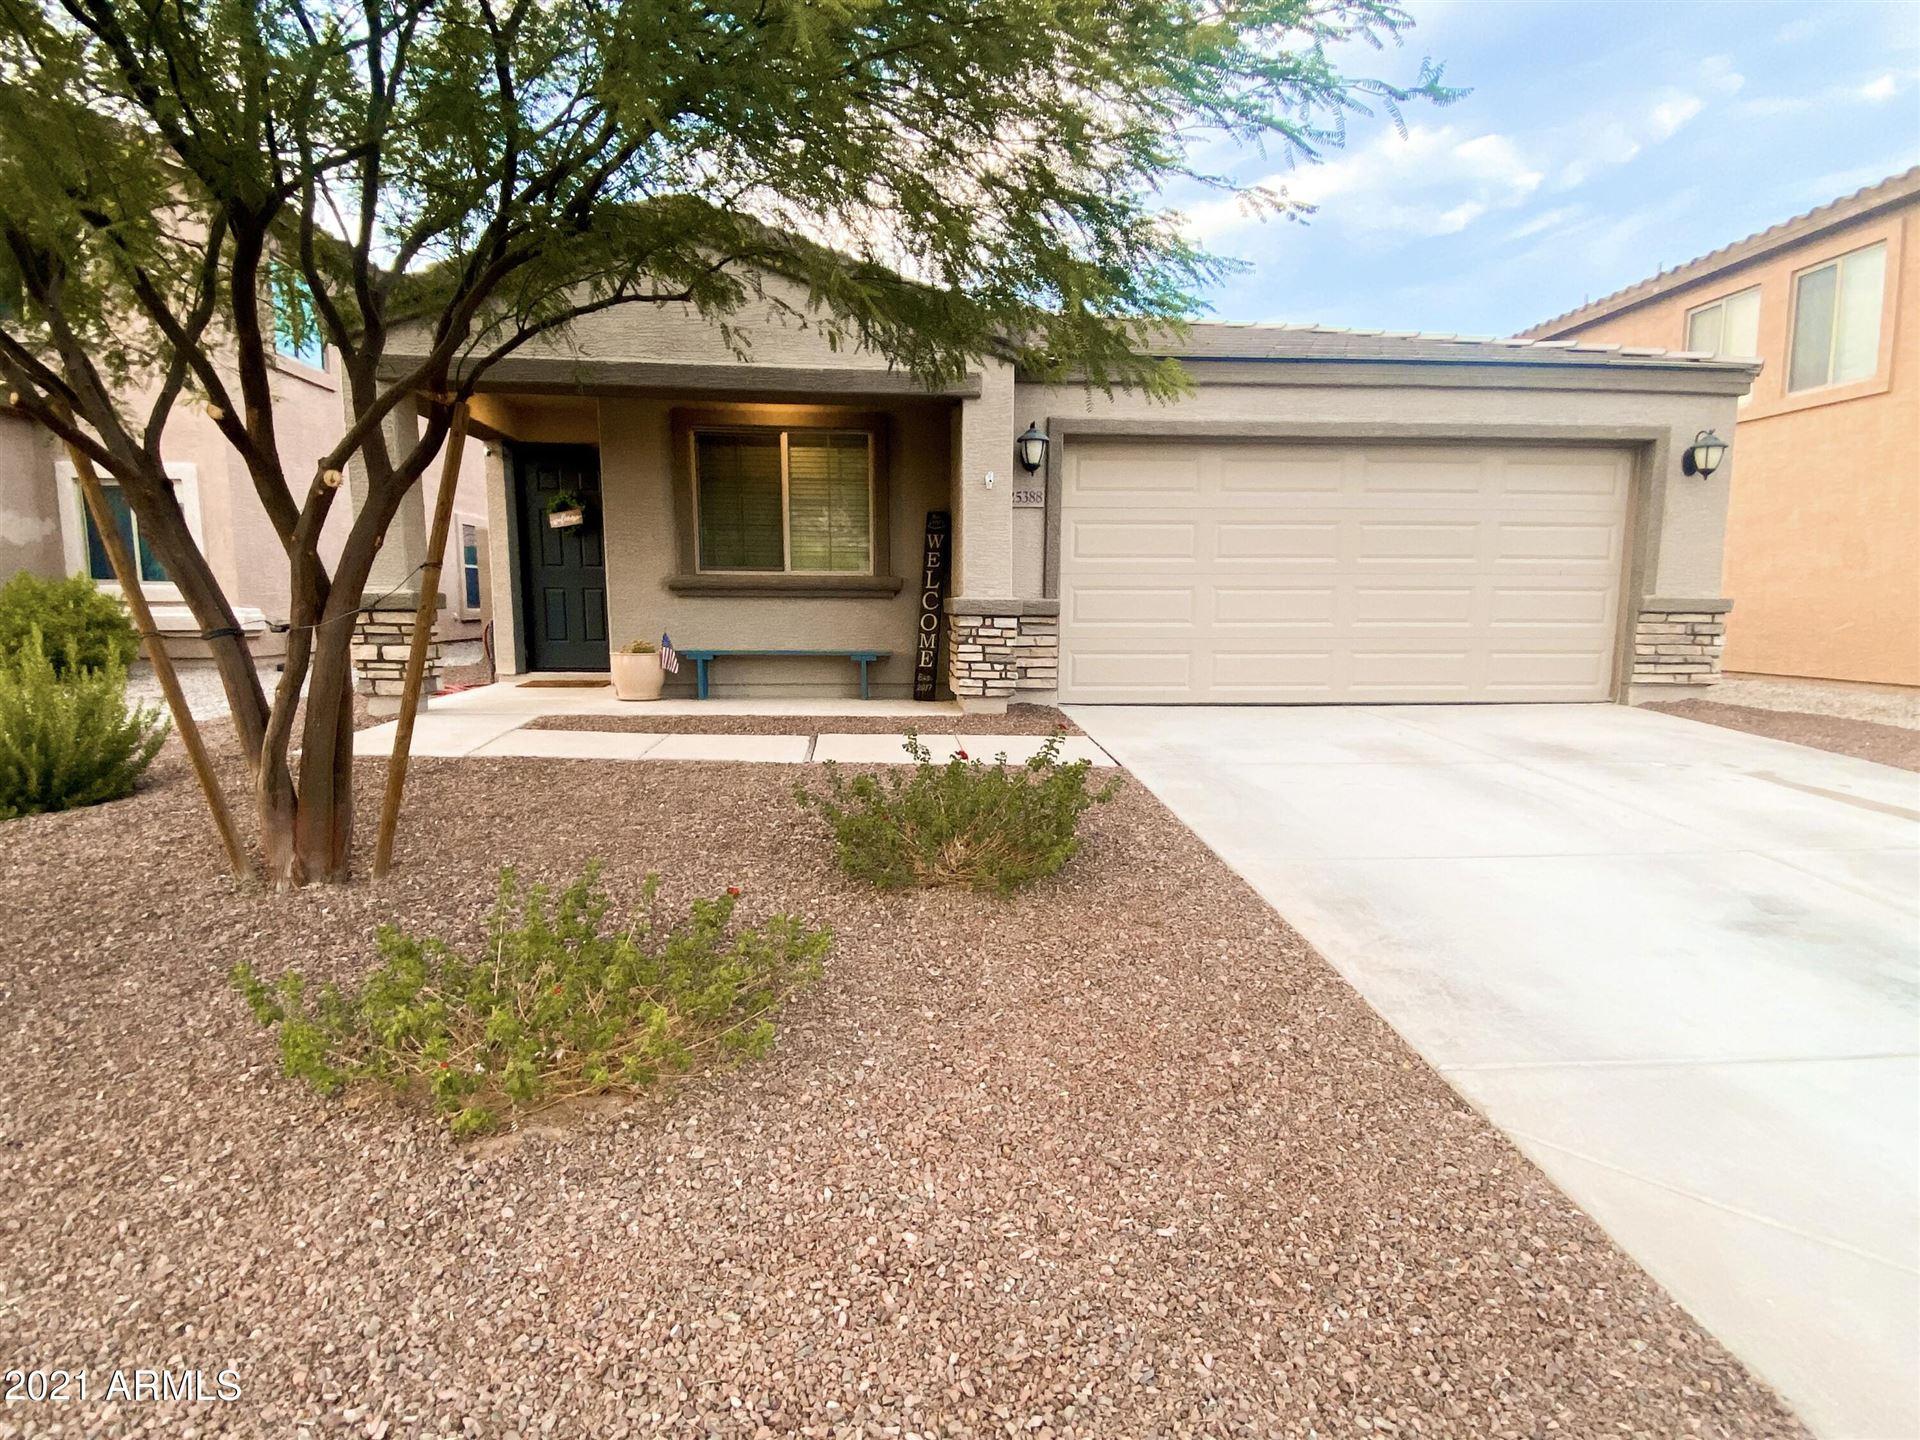 Photo of 25388 W JACKSON Avenue, Buckeye, AZ 85326 (MLS # 6268641)